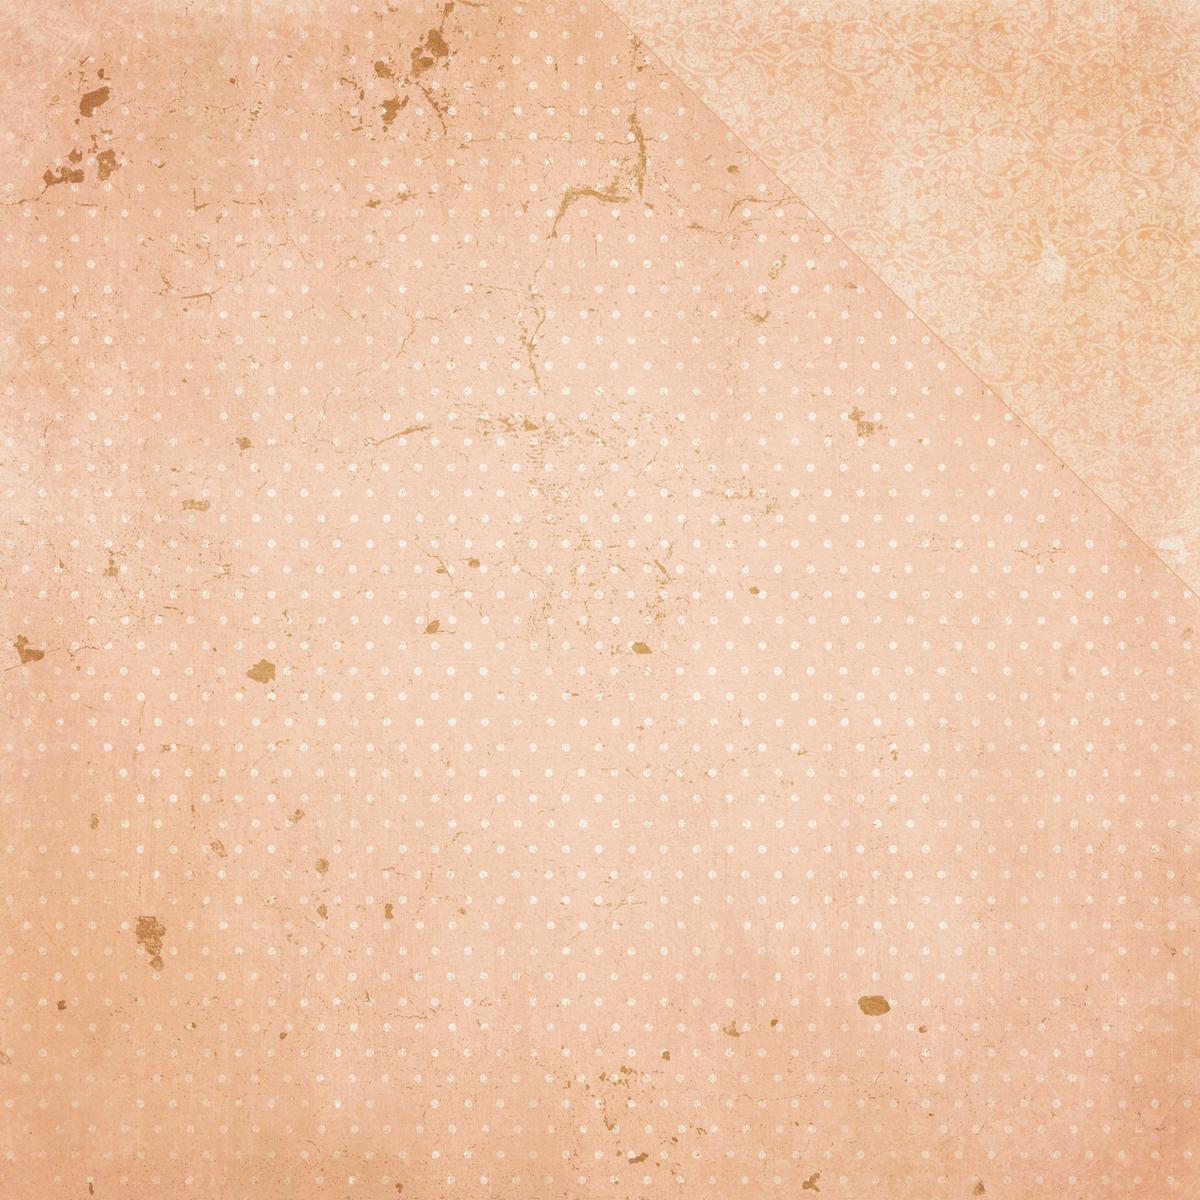 Double Dot Peaches & Cream Vintage Cardstock